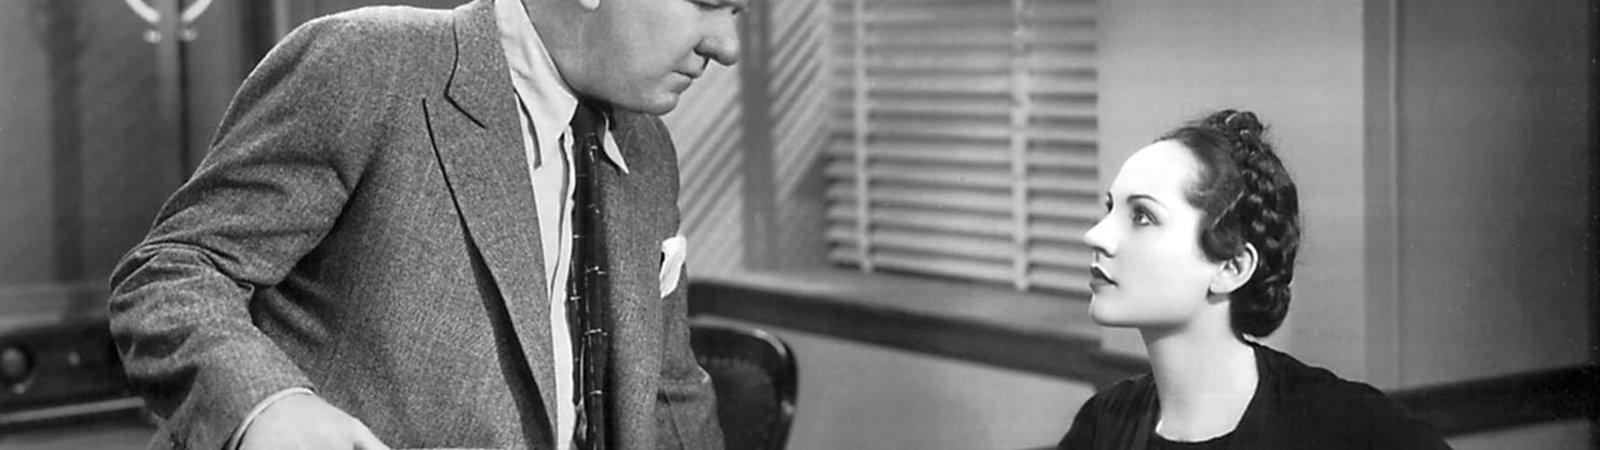 Photo dernier film Edward Cline